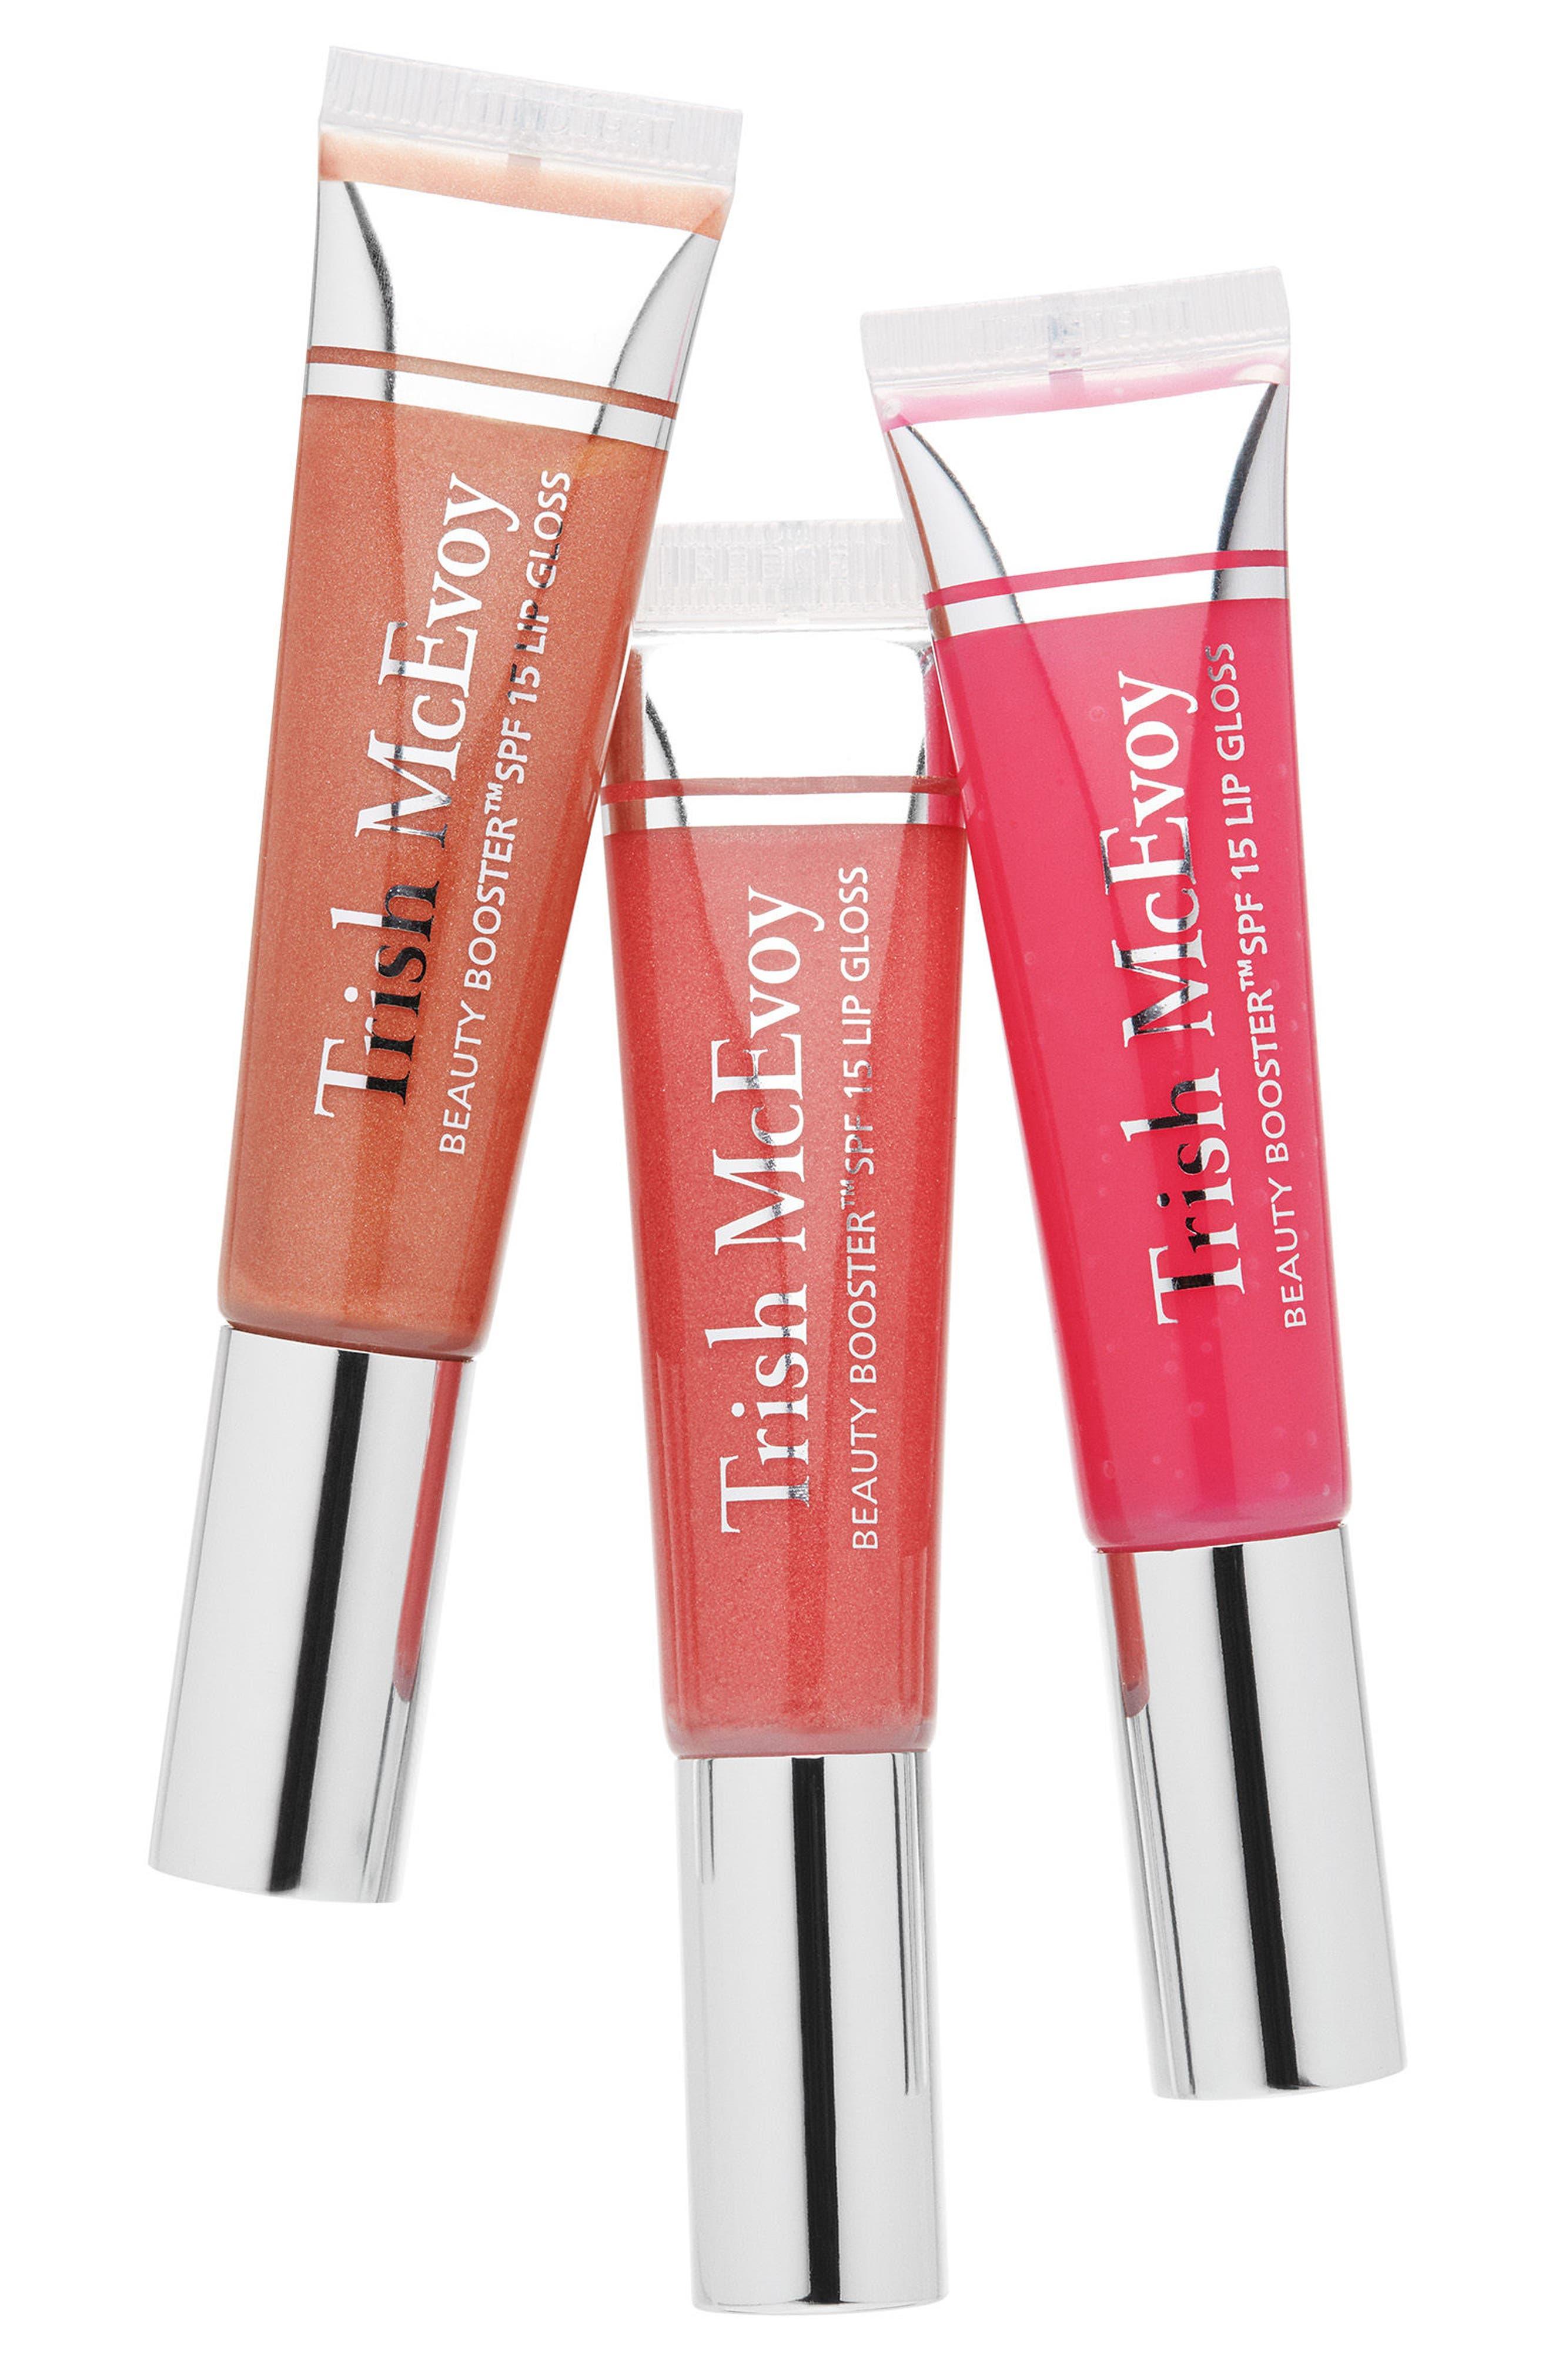 Beauty Booster<sup>®</sup> SPF 15 Lip Gloss Trio,                             Main thumbnail 1, color,                             000